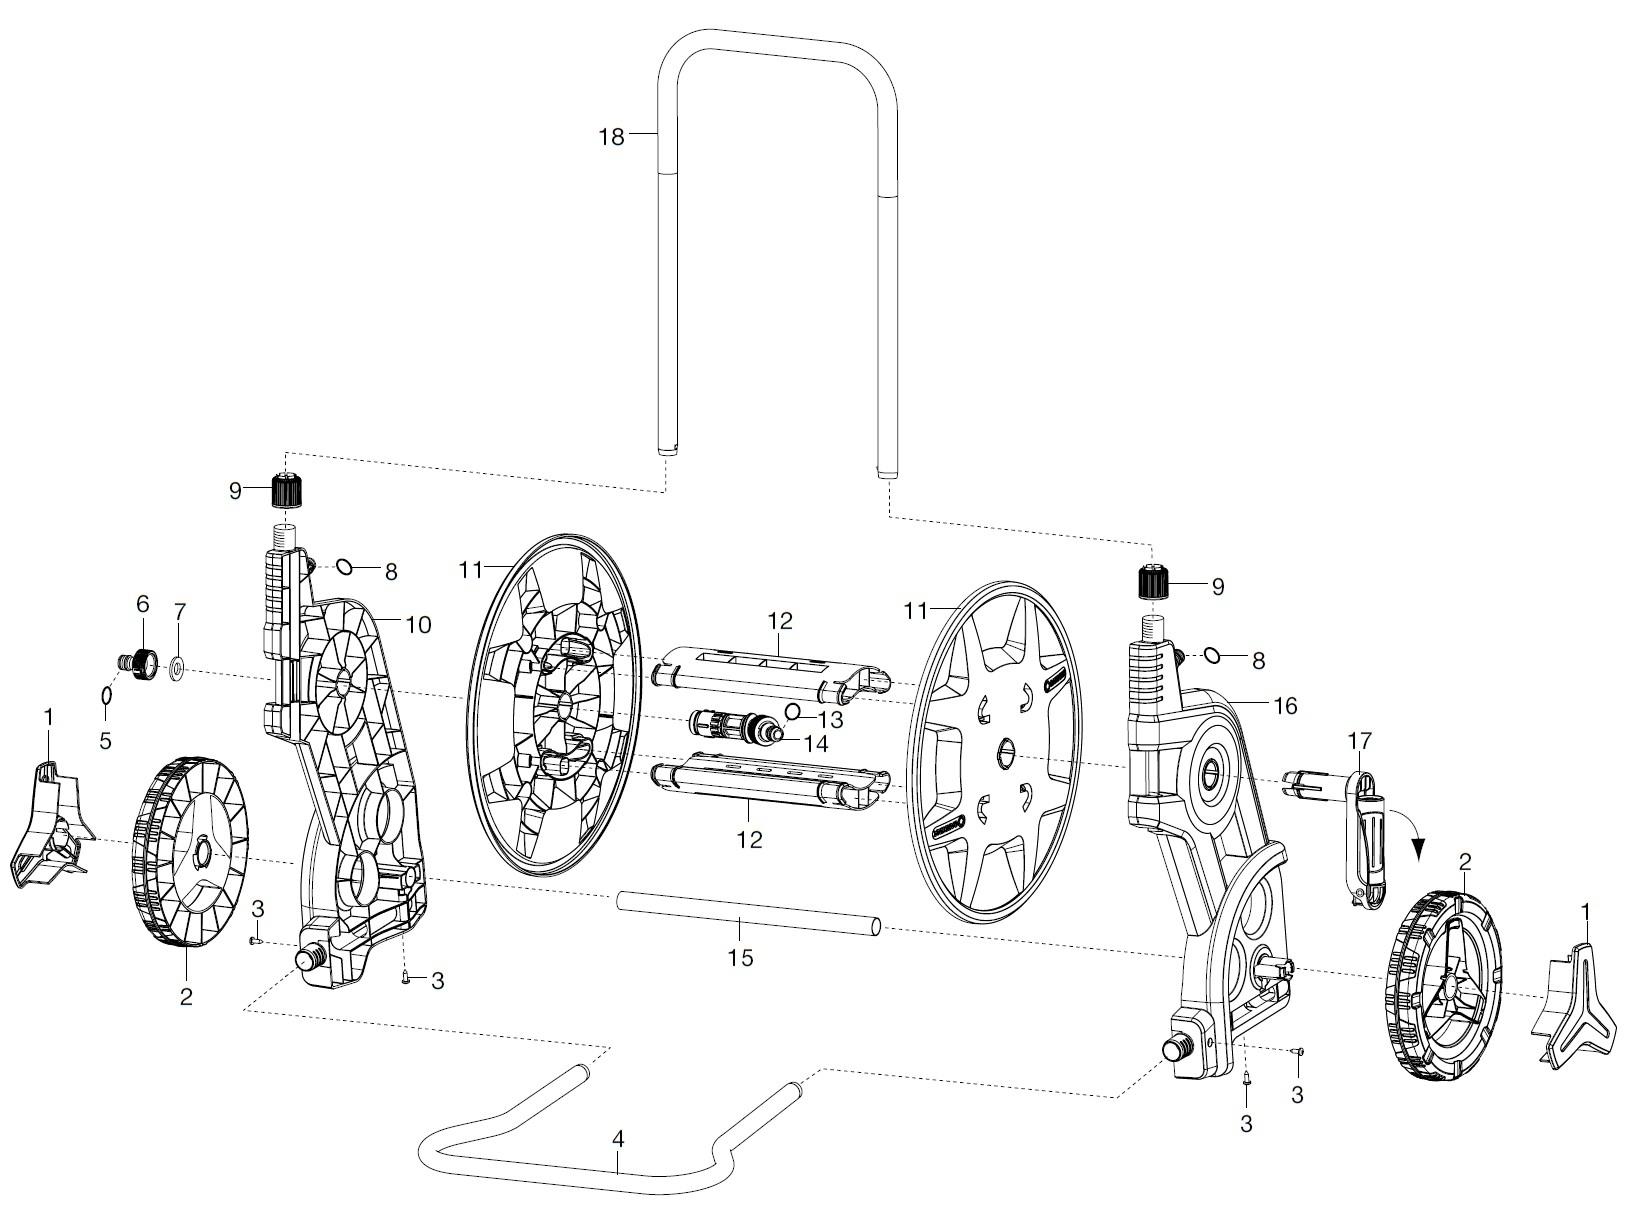 gardena ersatzteile classic schlauchwagen 60 ts 8000 8001 ersatzteil fee. Black Bedroom Furniture Sets. Home Design Ideas